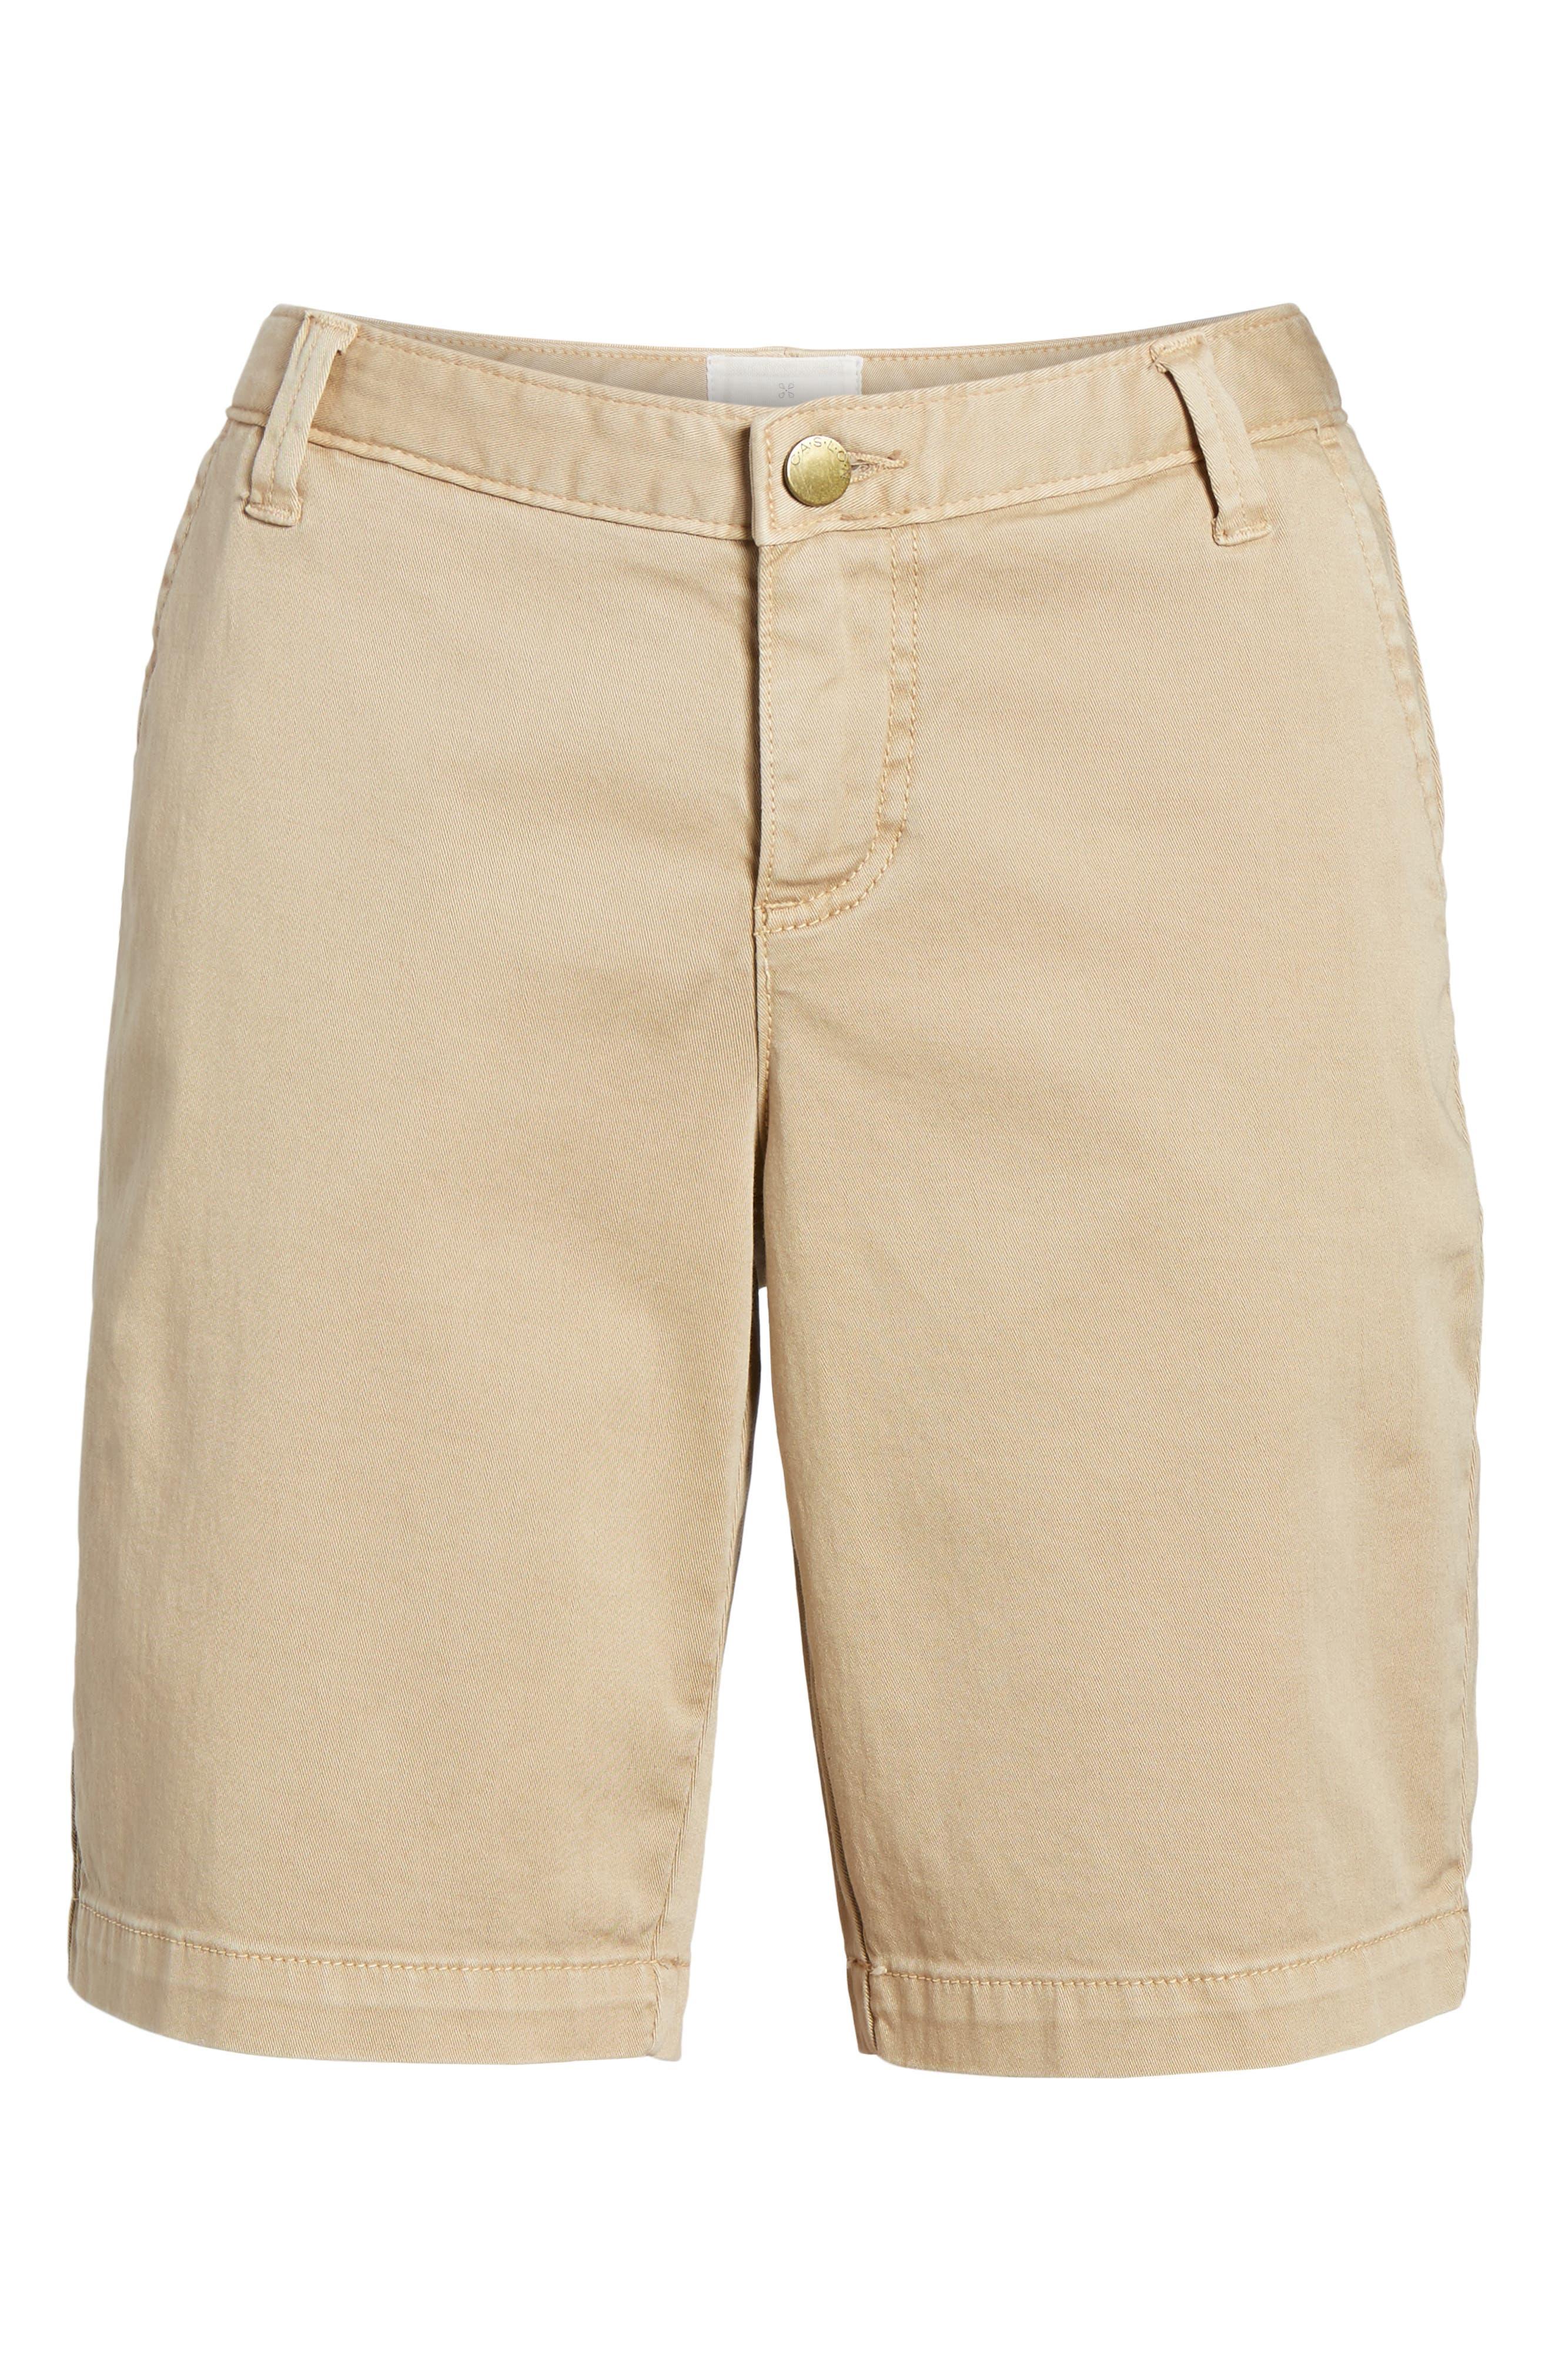 Twill Shorts,                             Alternate thumbnail 6, color,                             Tan Oxford